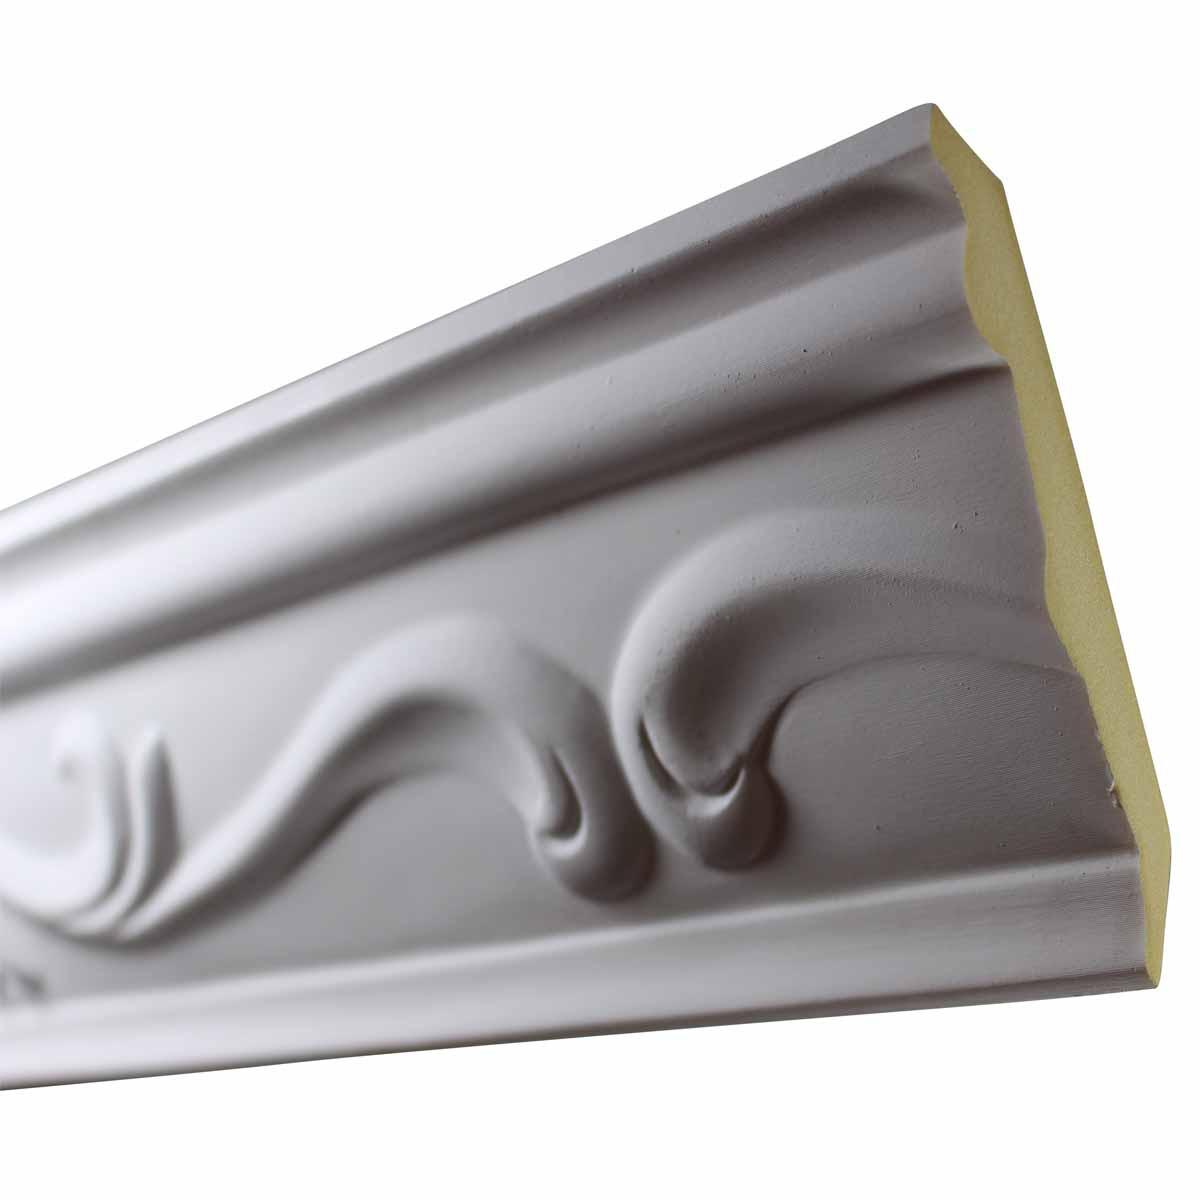 Cornice White Urethane Sample of 10512 19.75 Long Cornice Cornice Moulding Cornice Molding